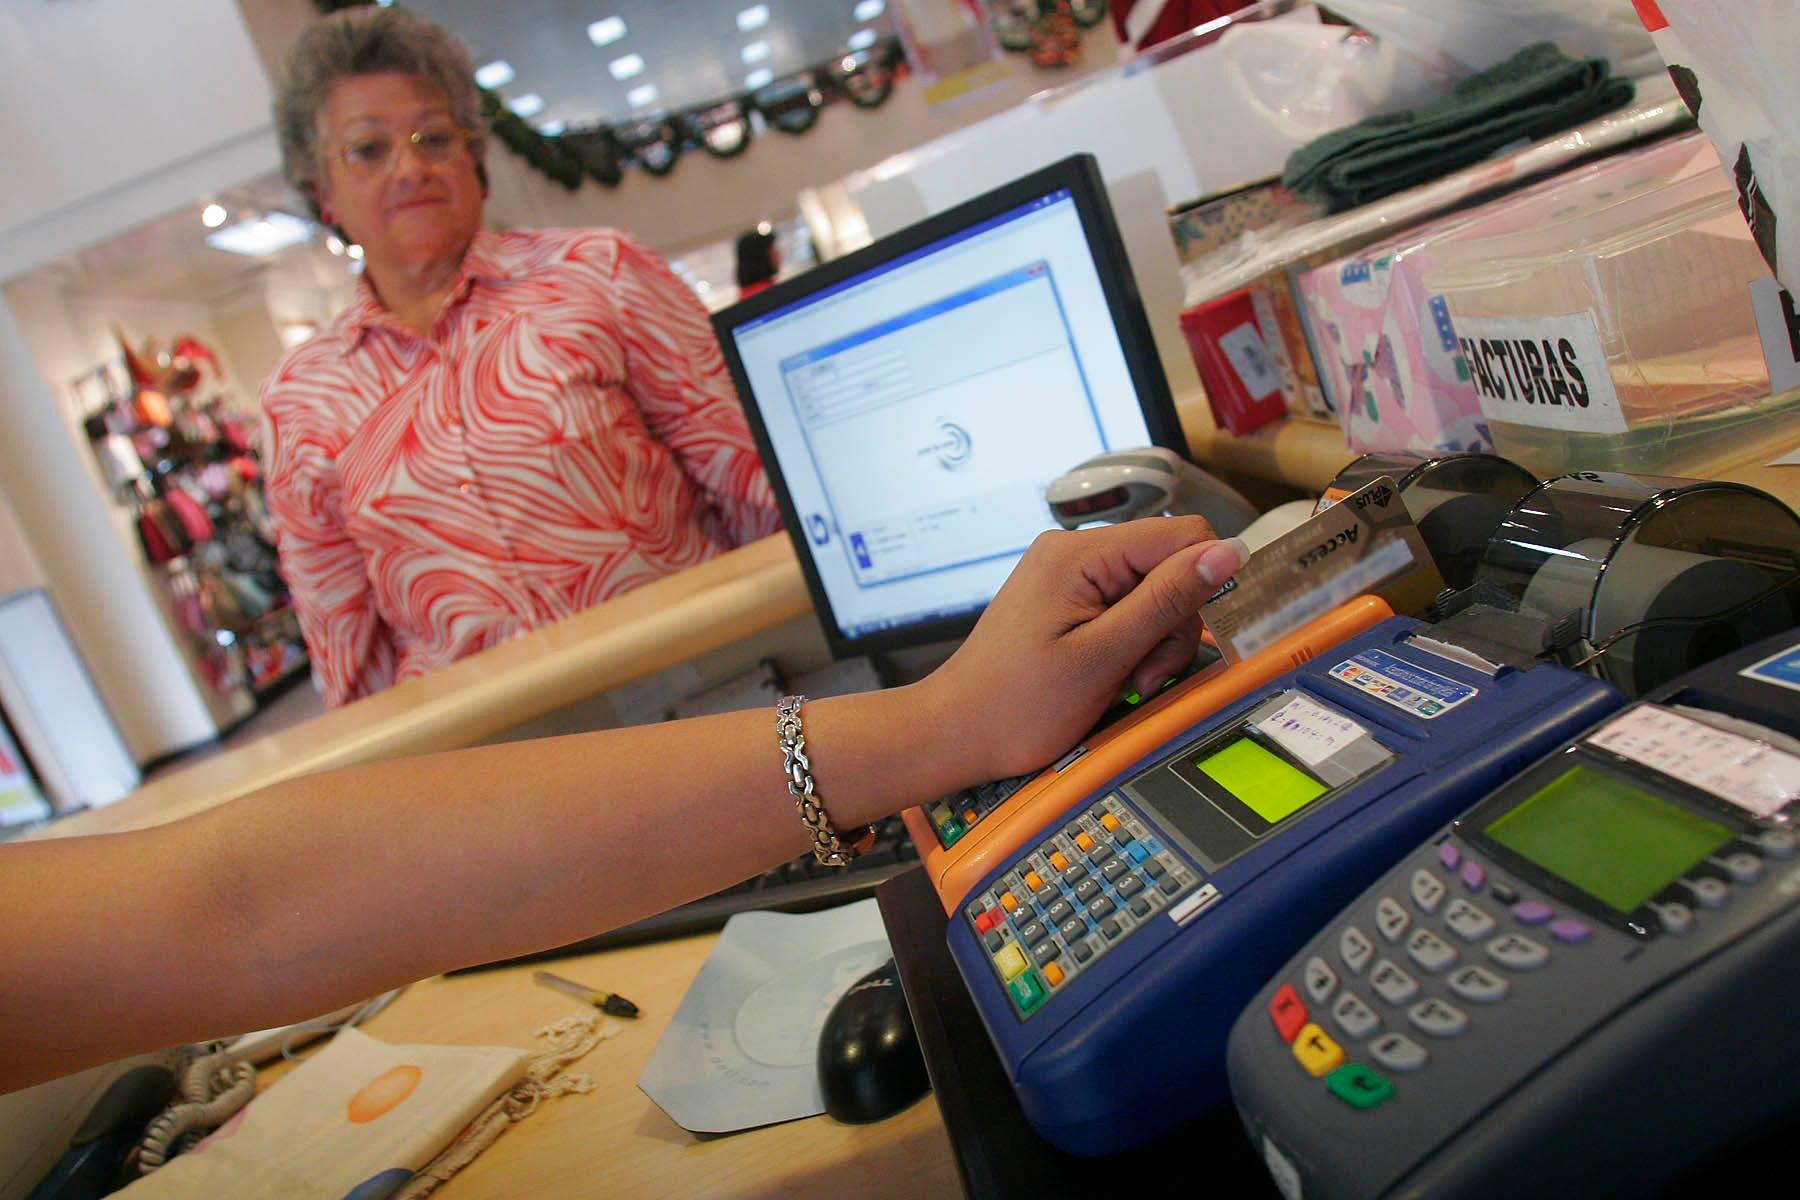 La tarjeta de crédito, útil si es bien utilizada